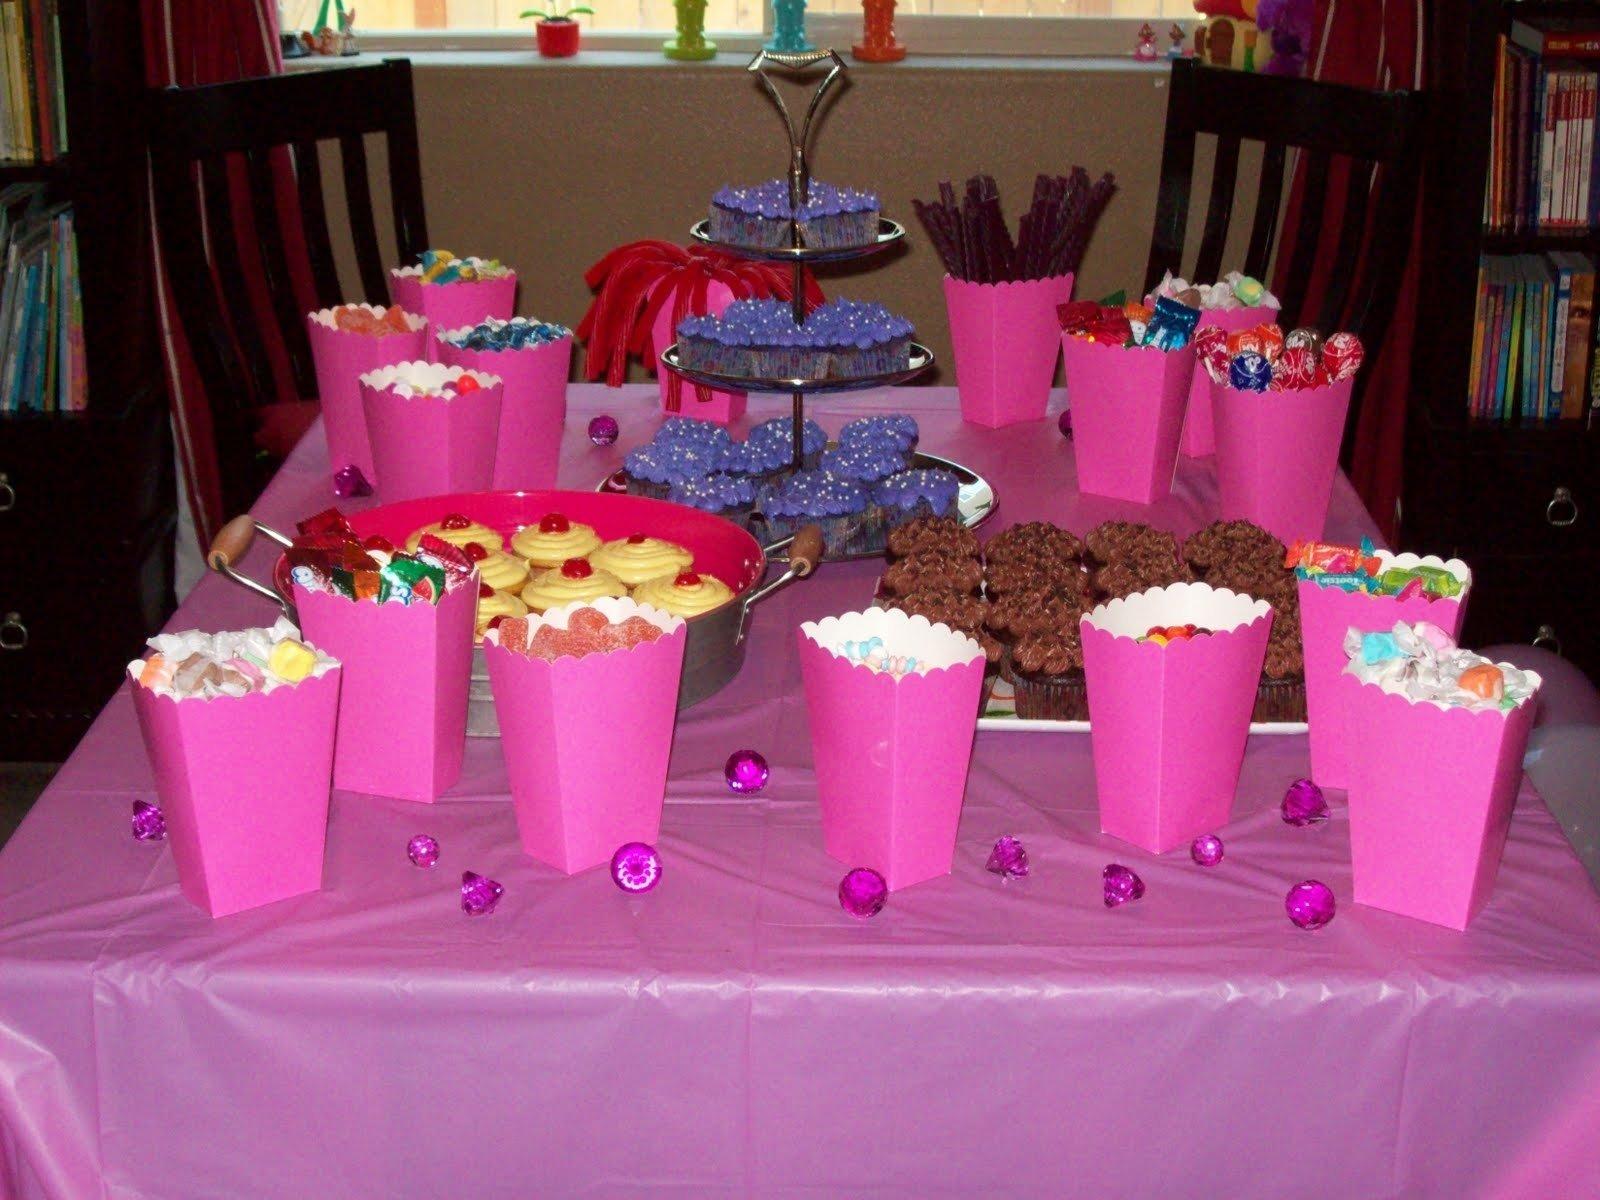 10 Fantastic Sweet 16 Ideas For Girls aprils homemaking sweet sixteen party 7 2021